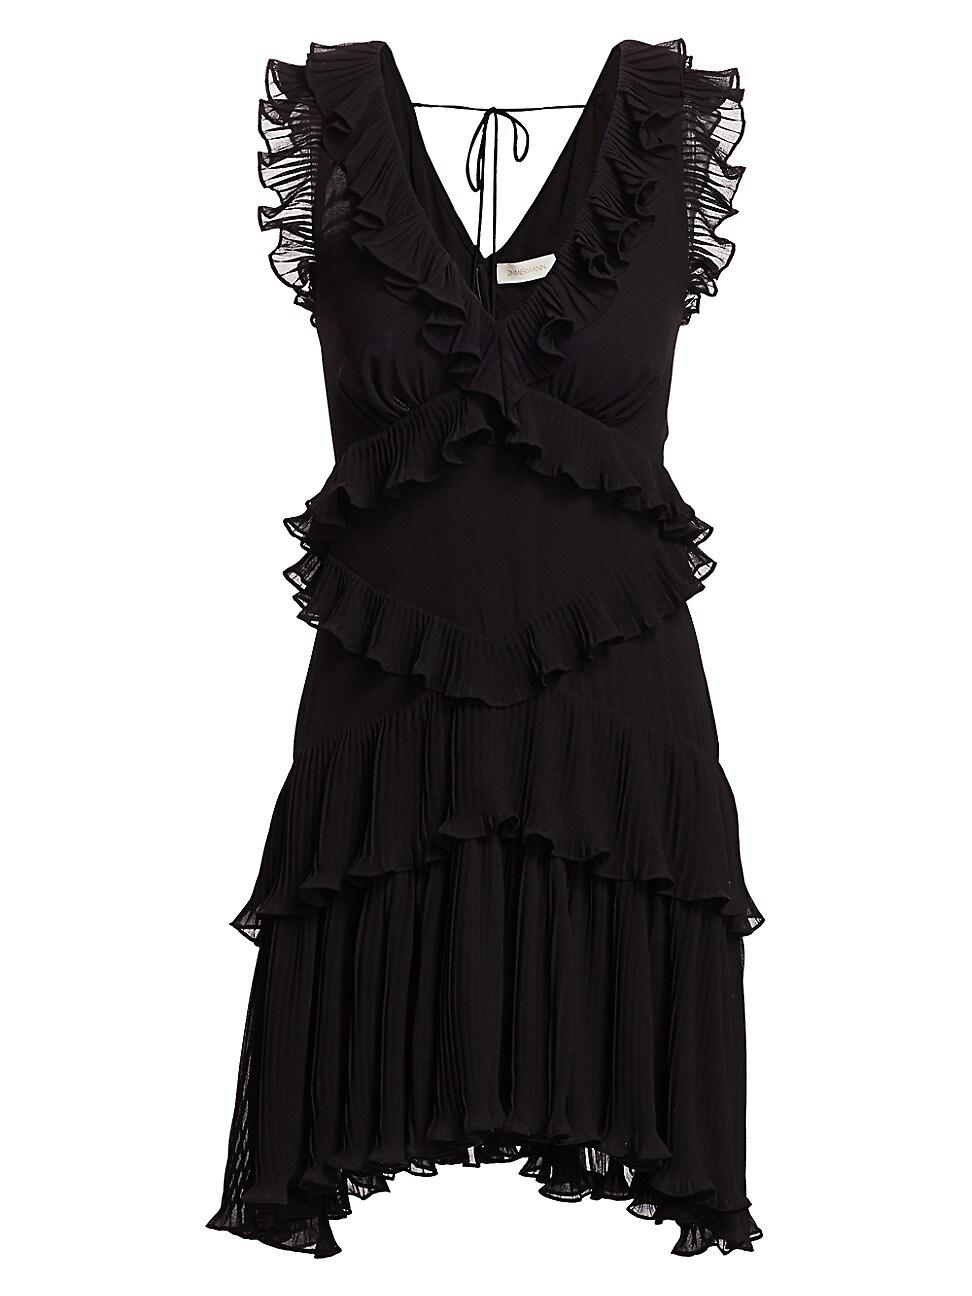 ZIMMERMANN WOMEN'S SUPER 8 FRILL MINI DRESS